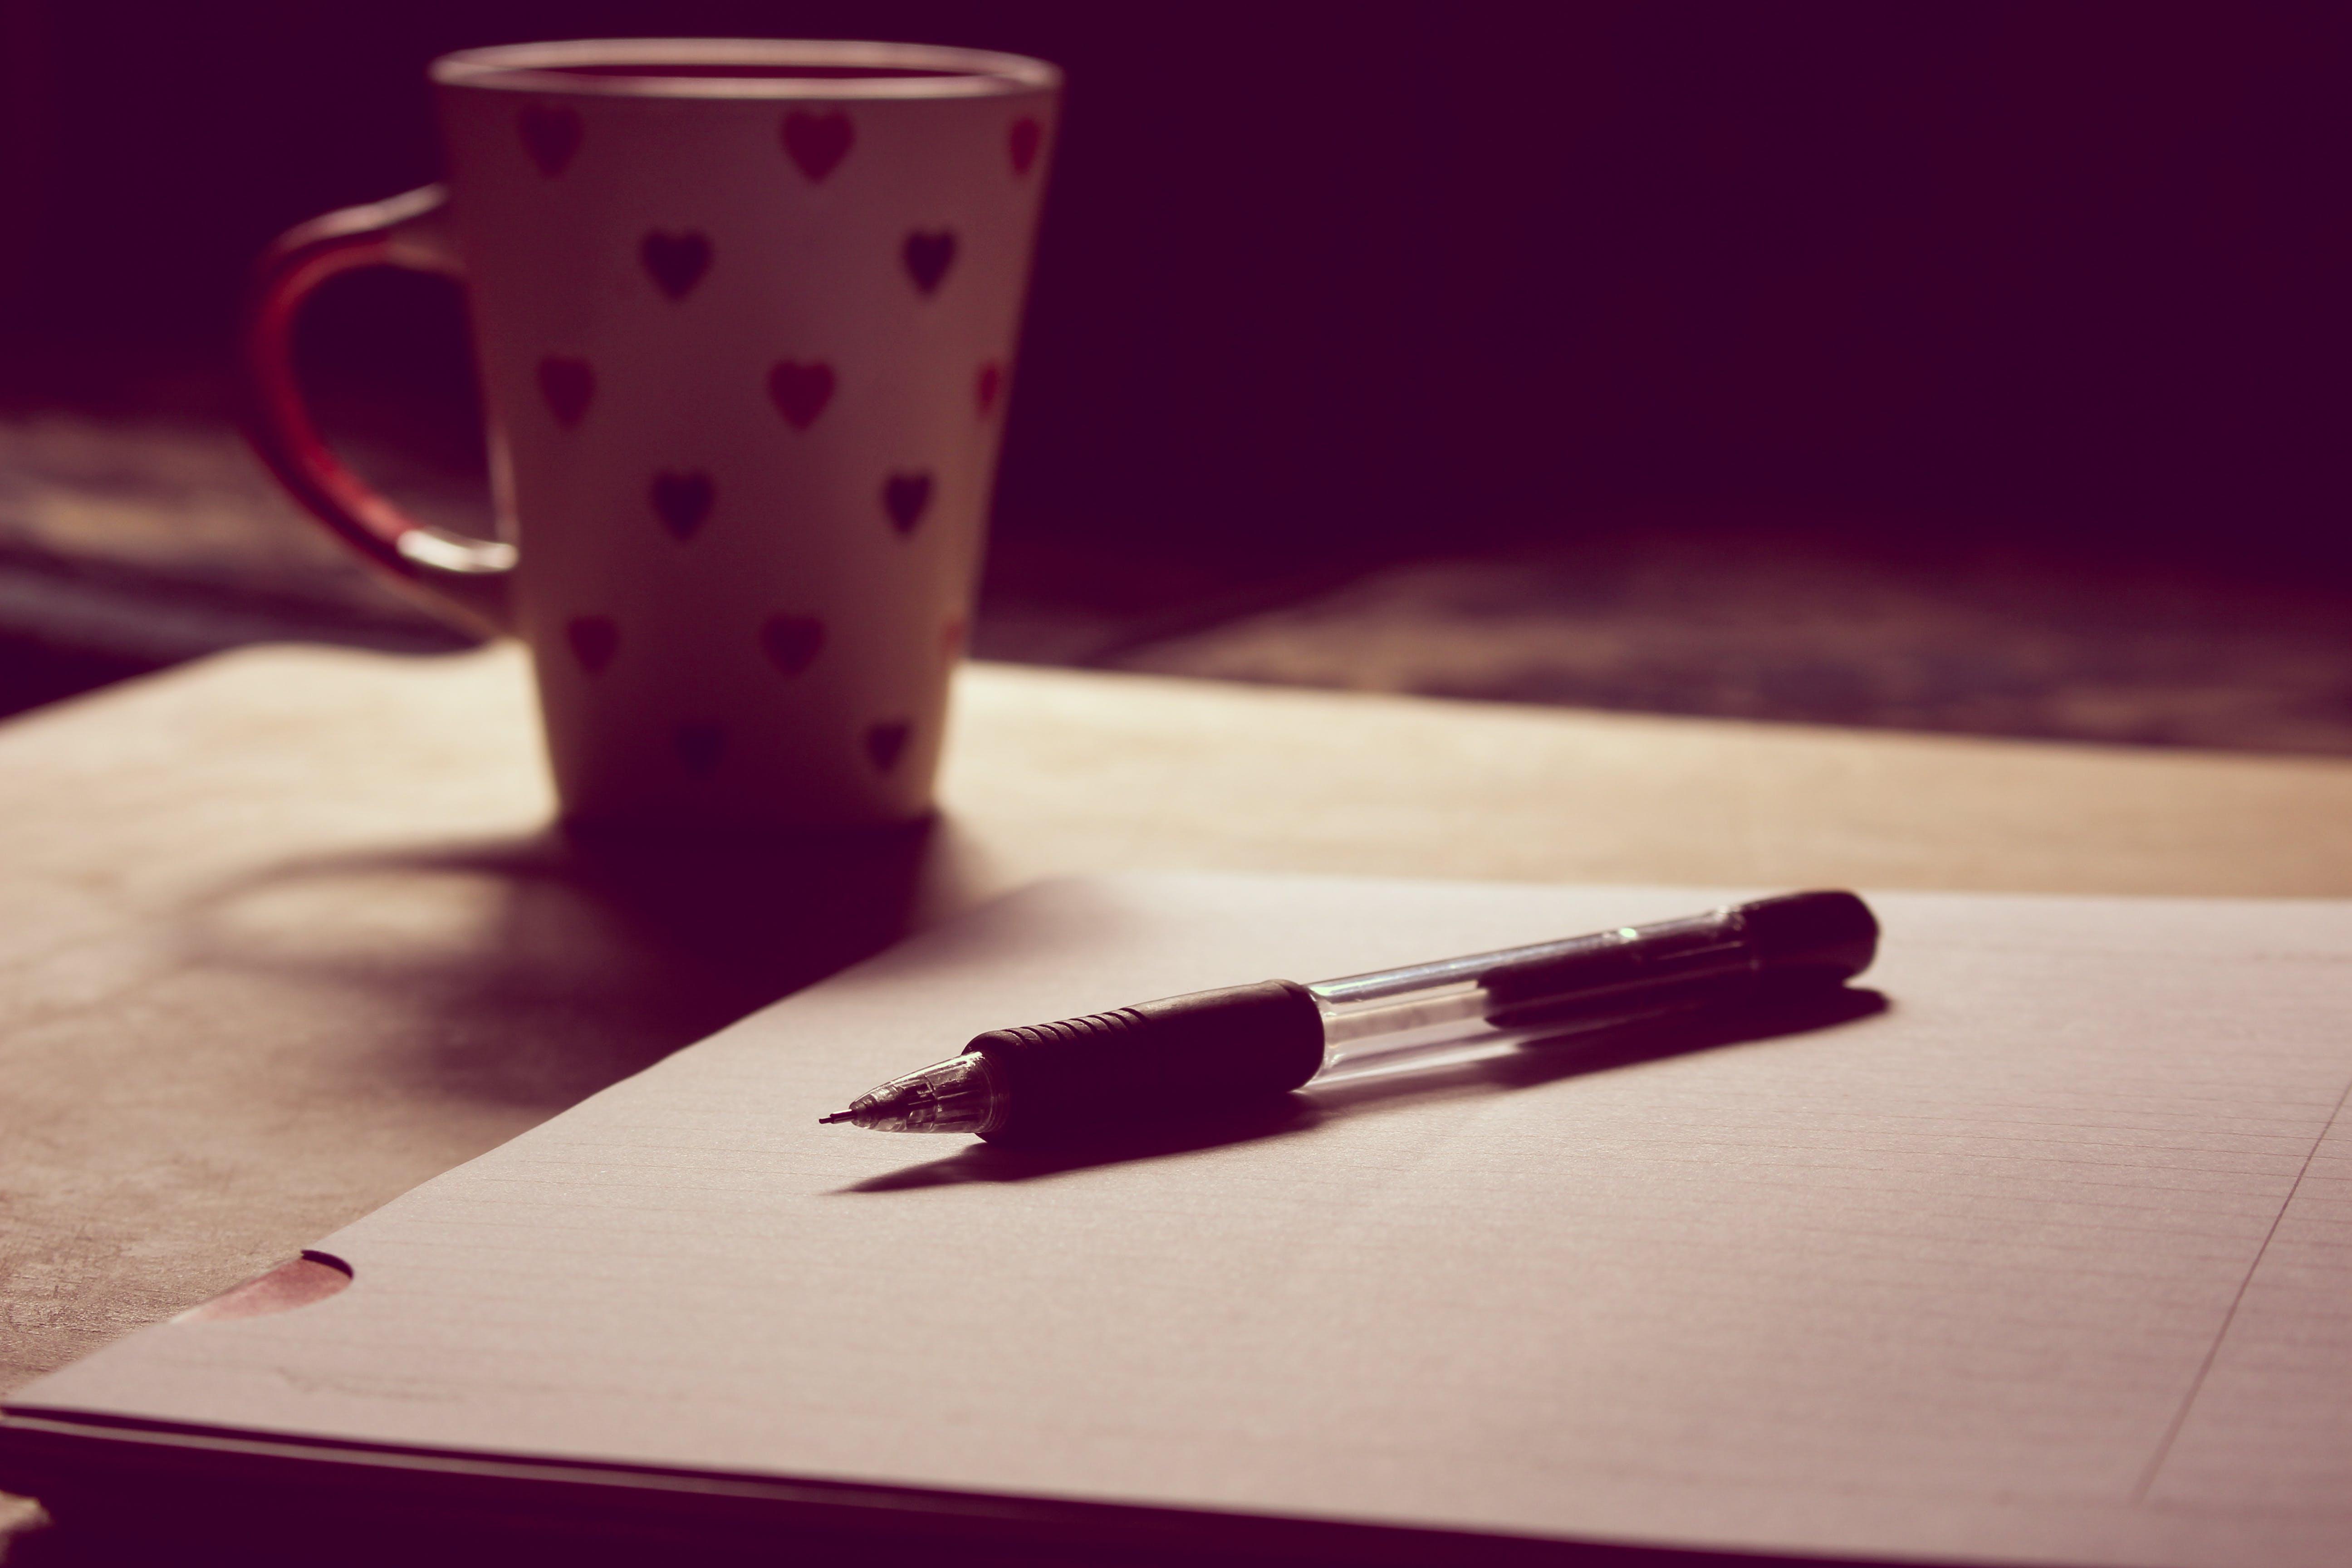 Black Pen on White Printed Paper Near White Ceramic Mug